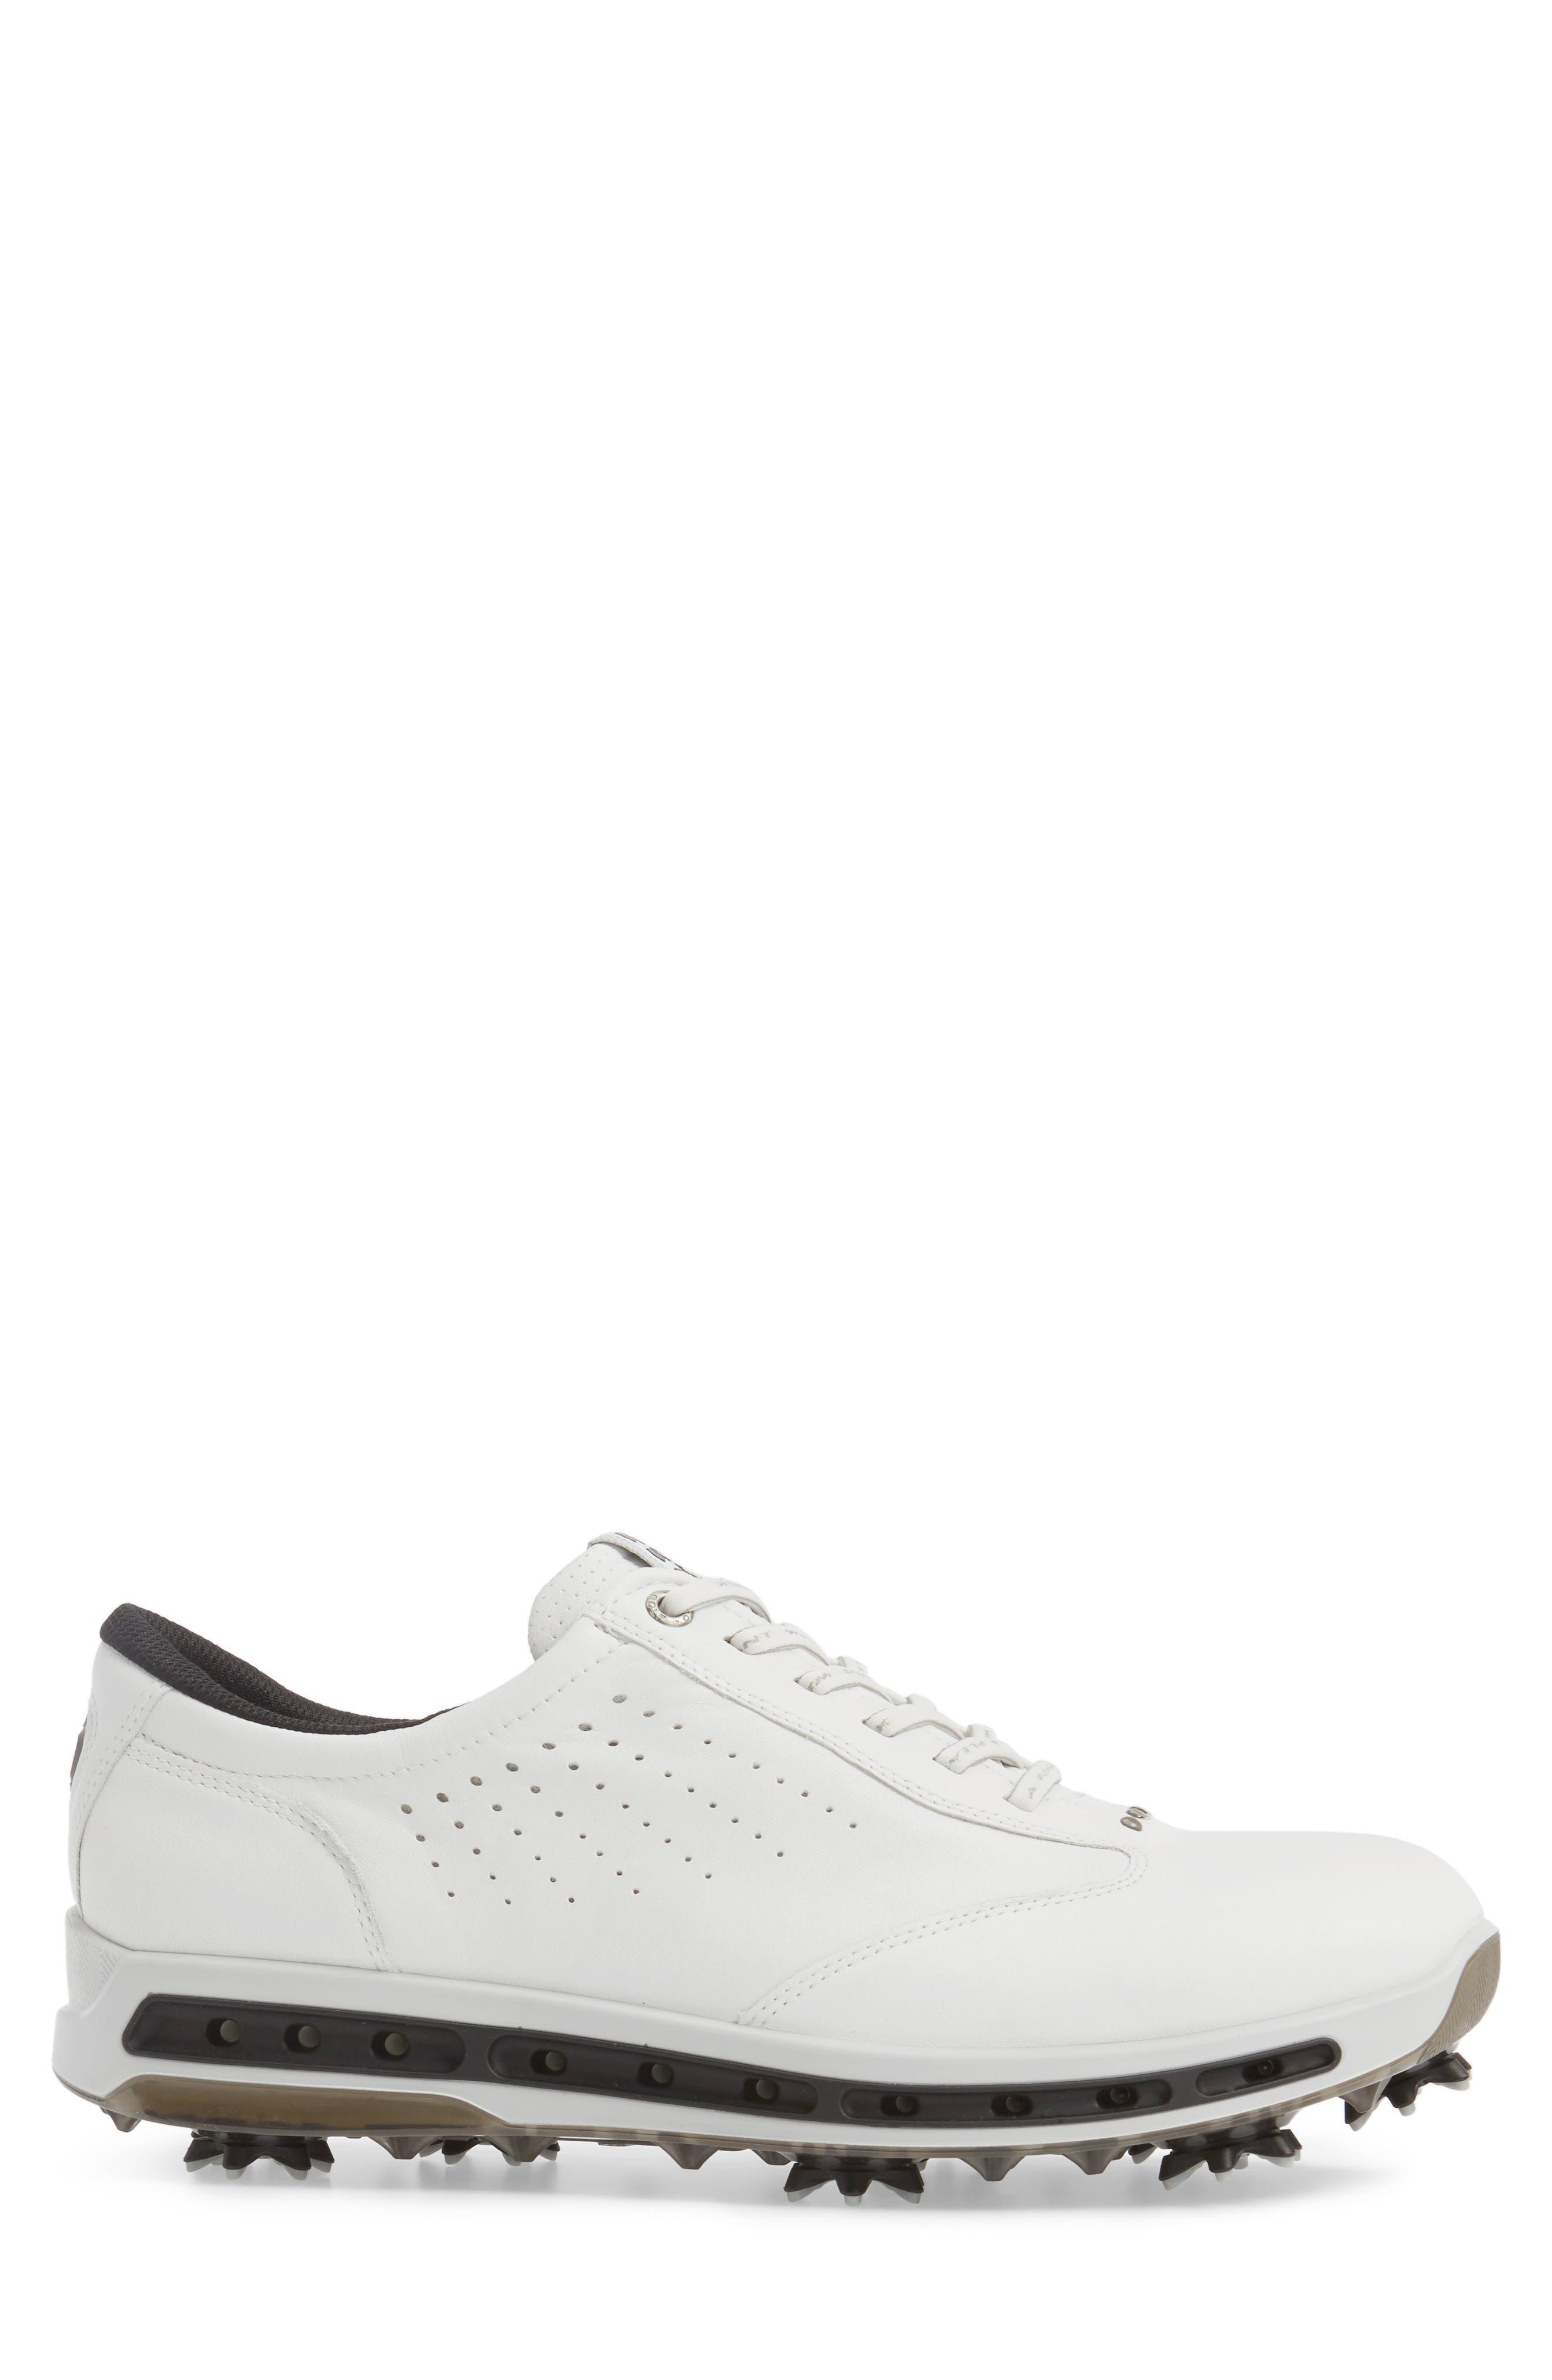 Cool GTX Golf Shoe,                             Alternate thumbnail 3, color,                             White/ Black